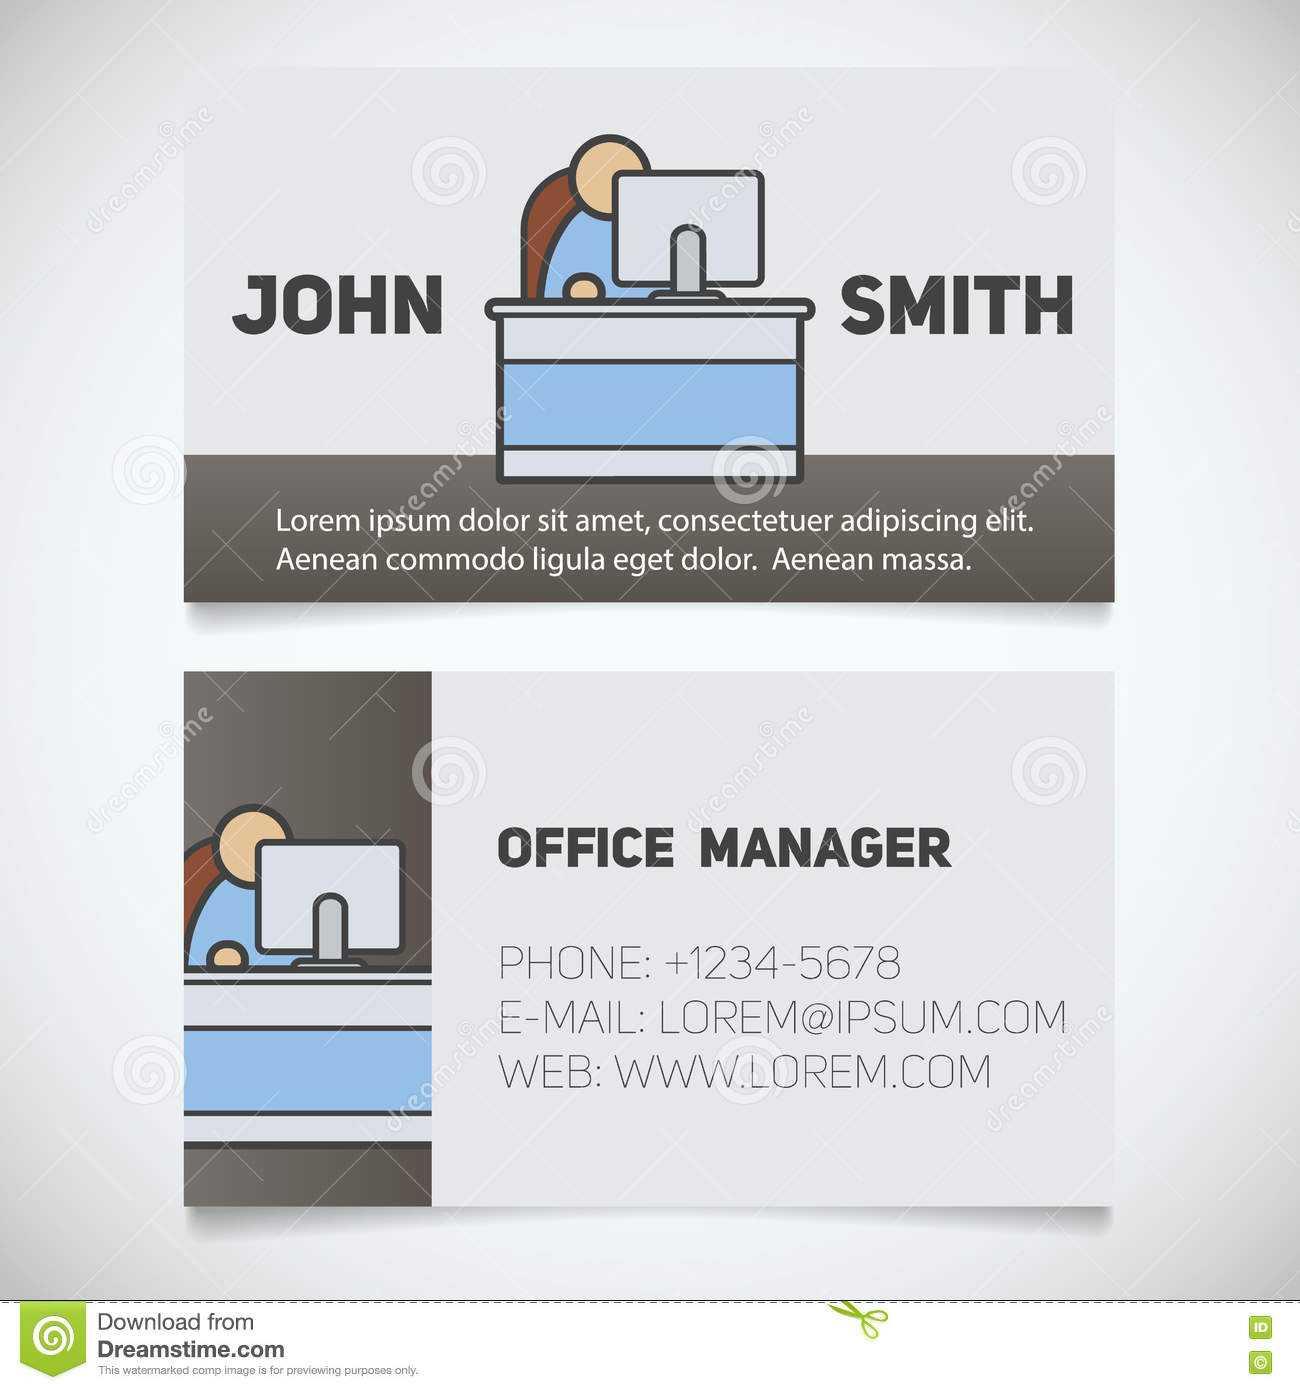 017 Template Ideas Business Card Print Office Manager Logo With Office Max Business Card Template